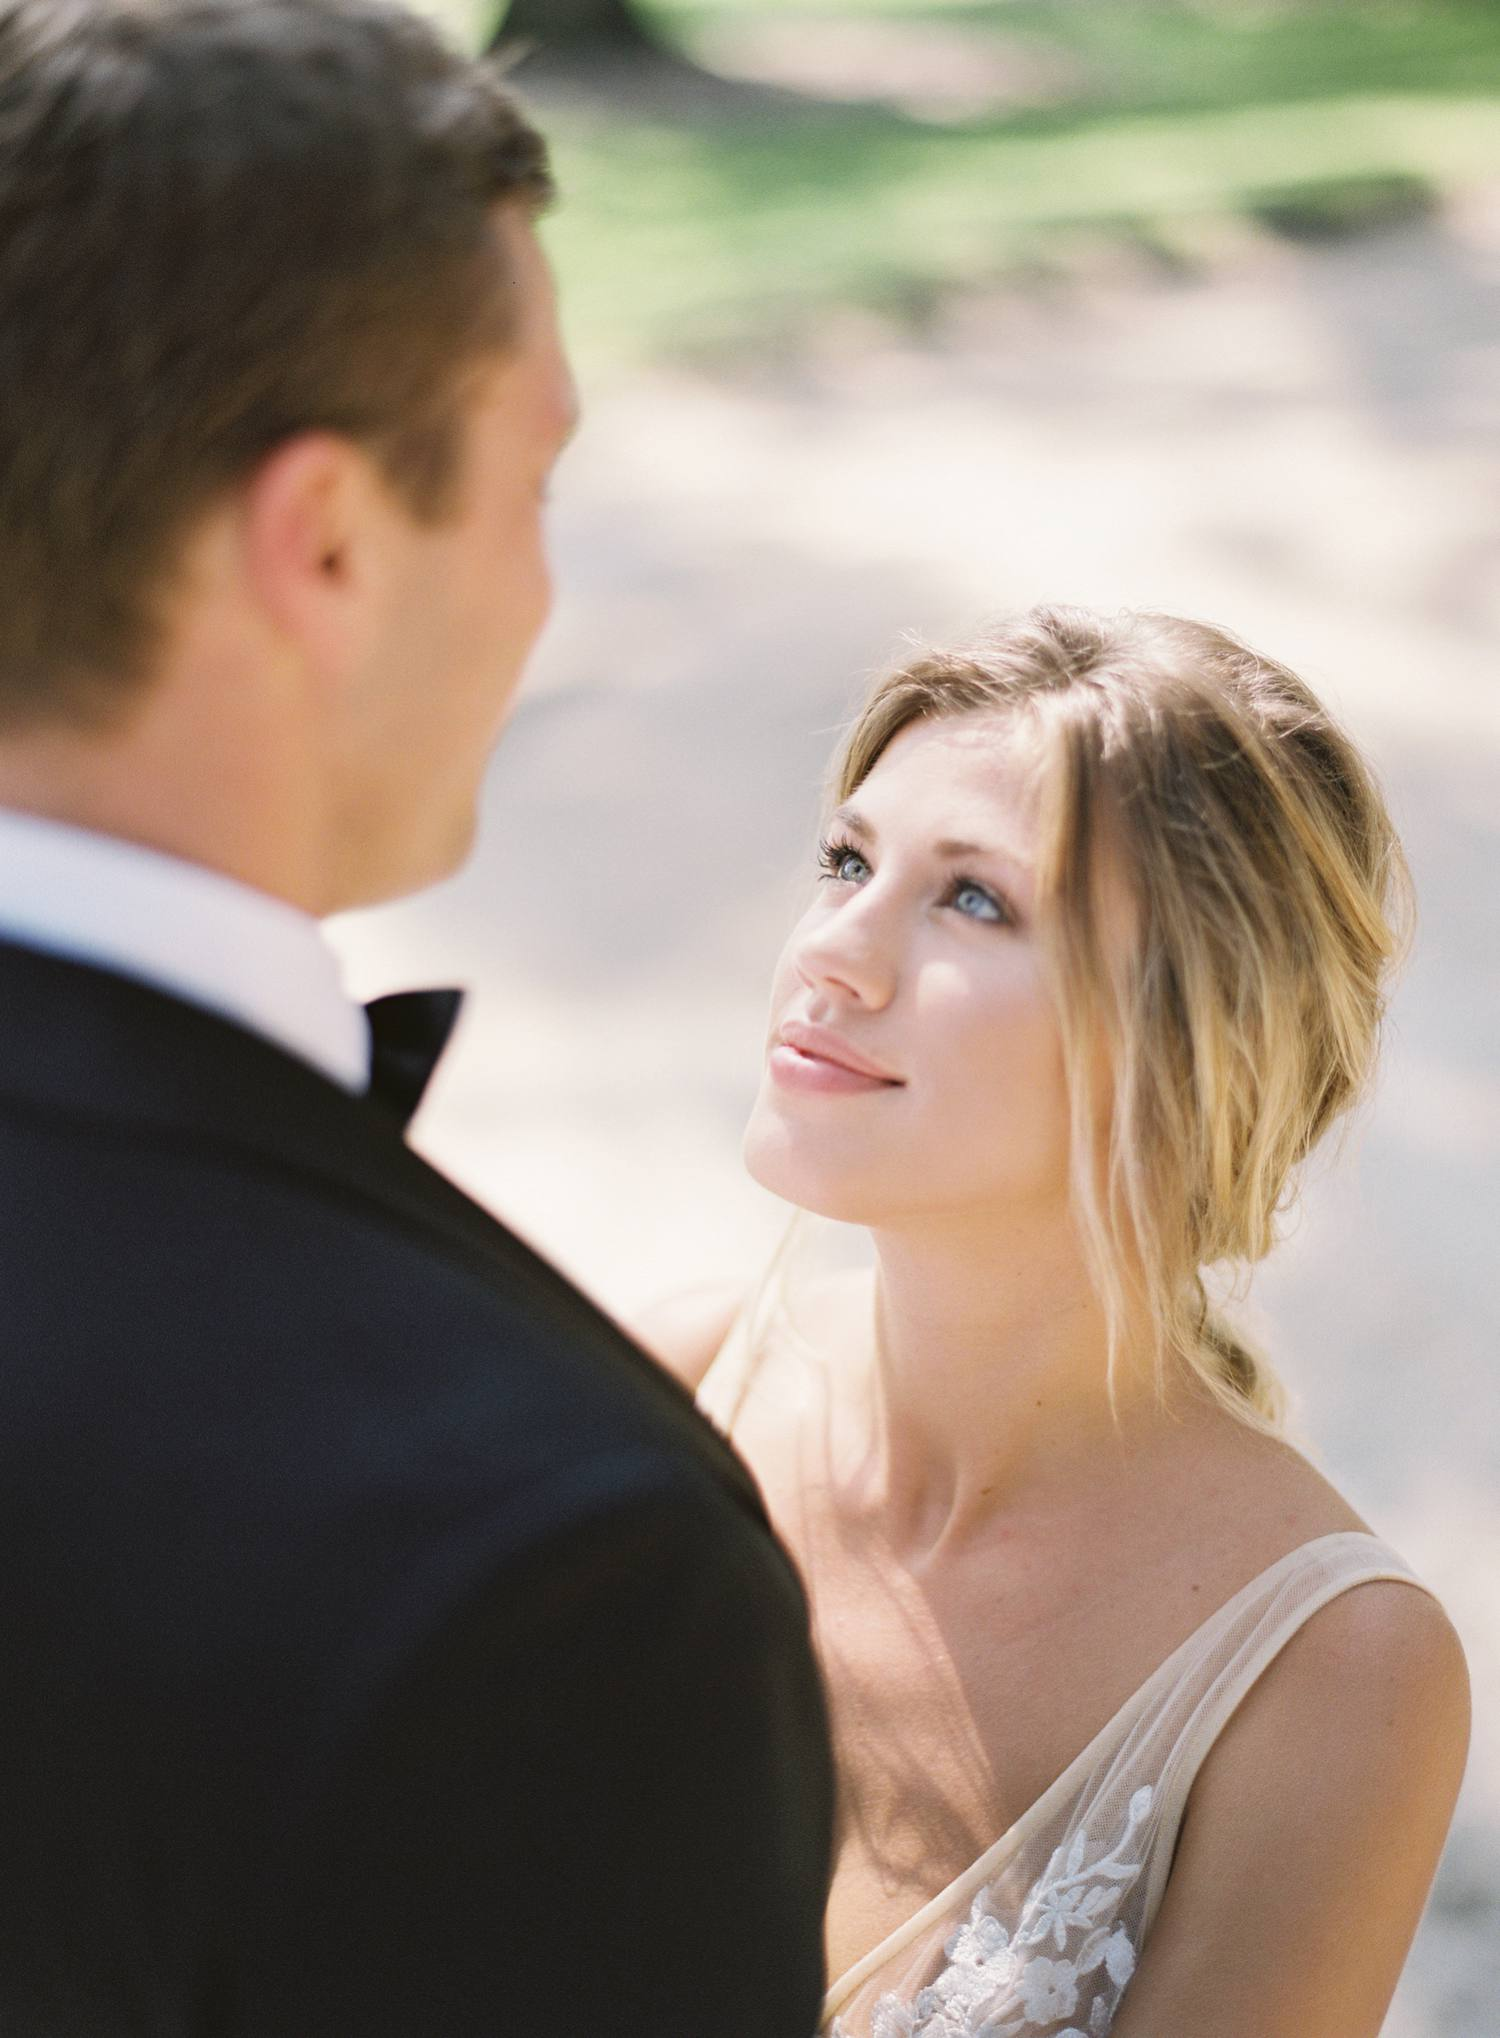 boonehallplantation_wedding_28.jpg